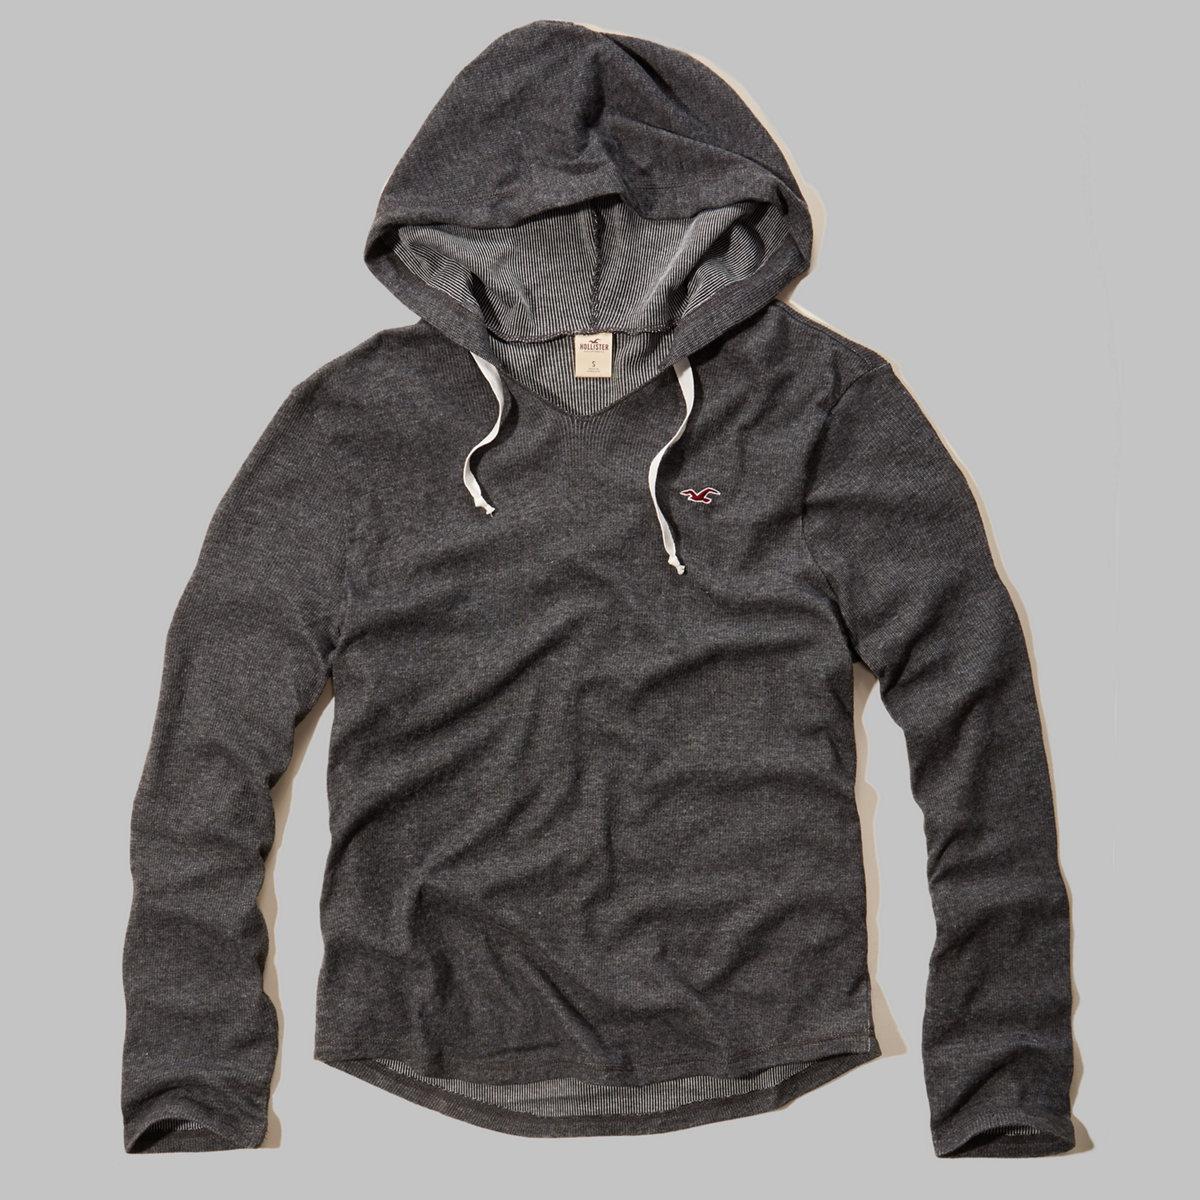 Boat Canyon Soft Knit T-Shirt Hoodie